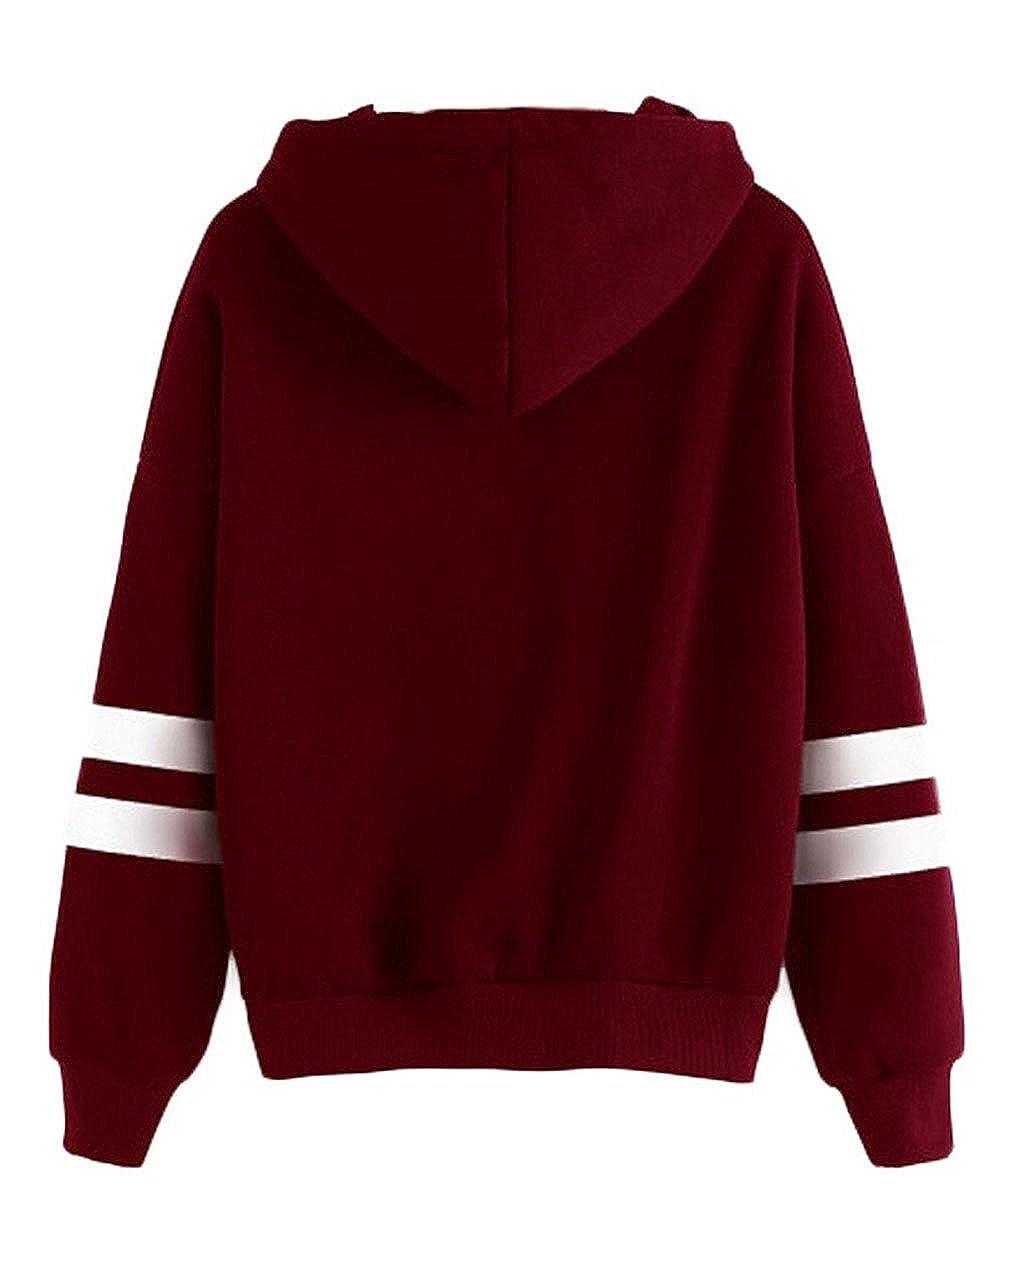 Women Girl Long Sleeve Hoodie Sweatshirt Simple Style Solid Color Hooded Pullover Tops Casual Blouse